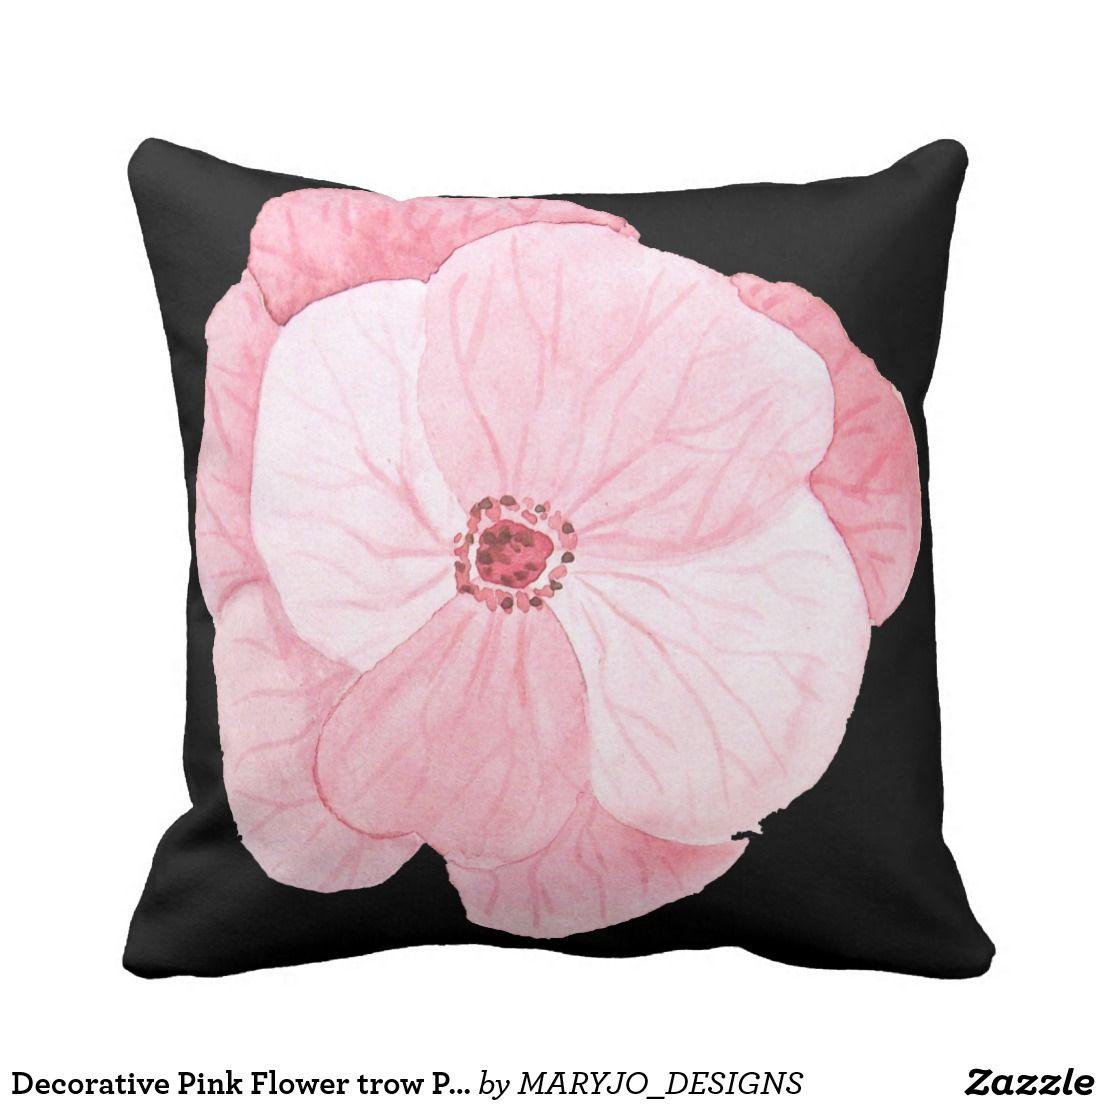 Decorative Pink Flower Trow Pillow Zazzle Com Pillows Flower Pillow Pink Flowers